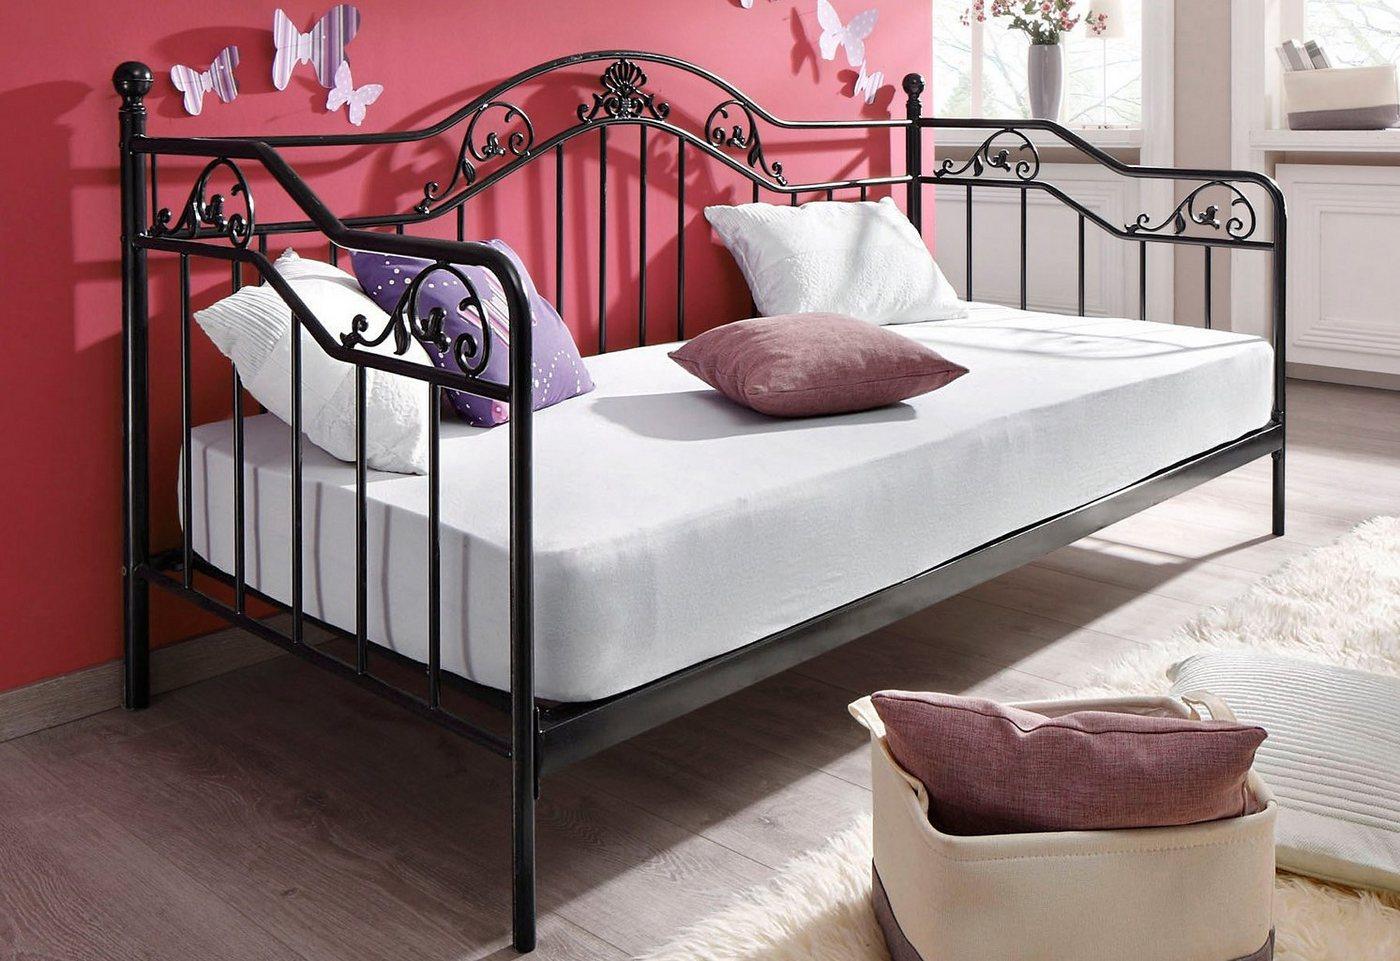 Bed/bank